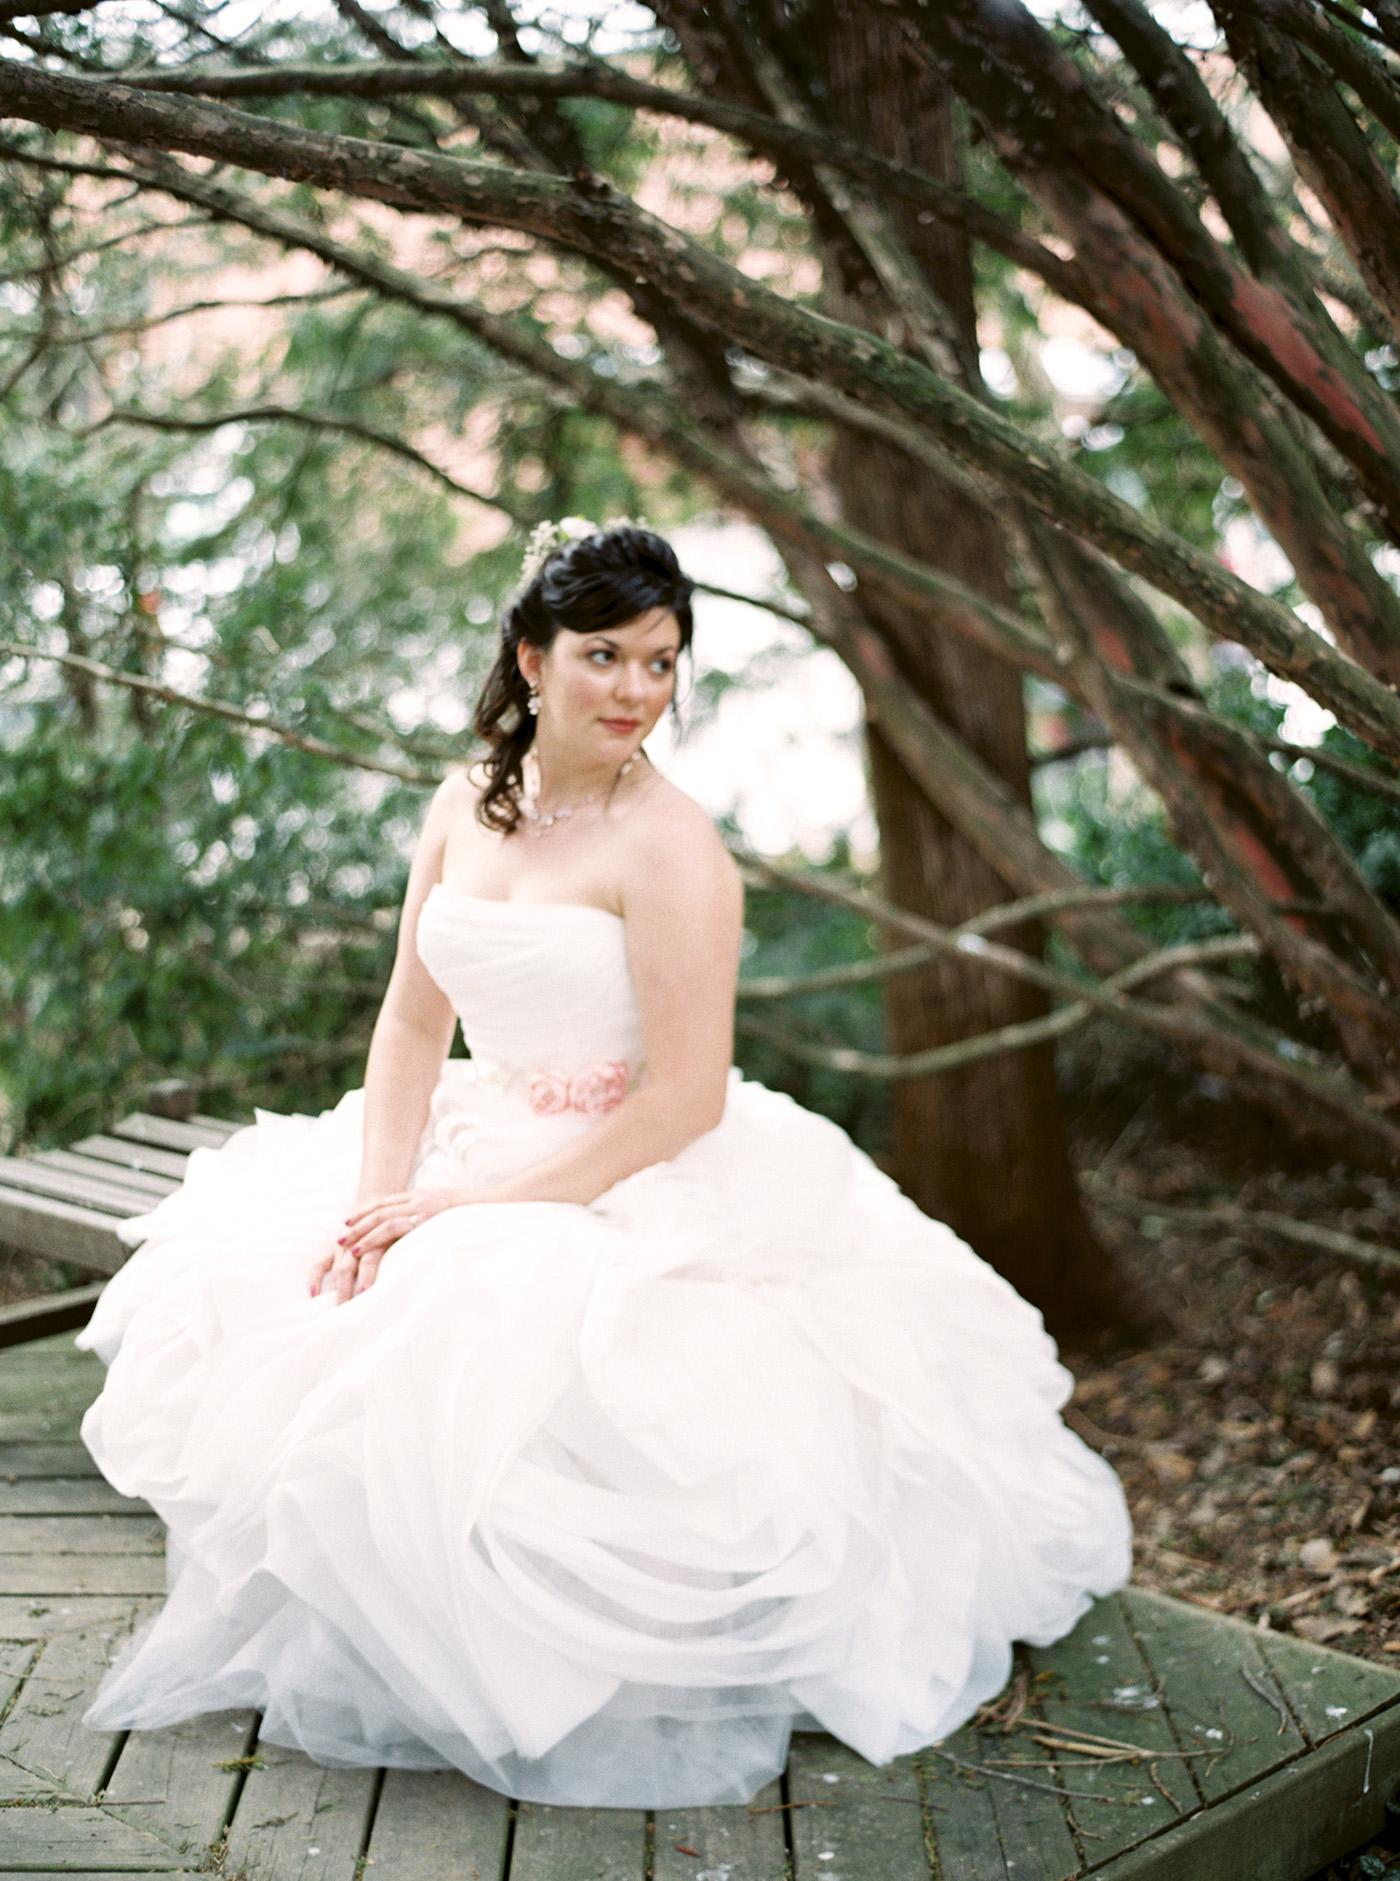 DianaElizabethPhotography_KatelinBridals029.JPG